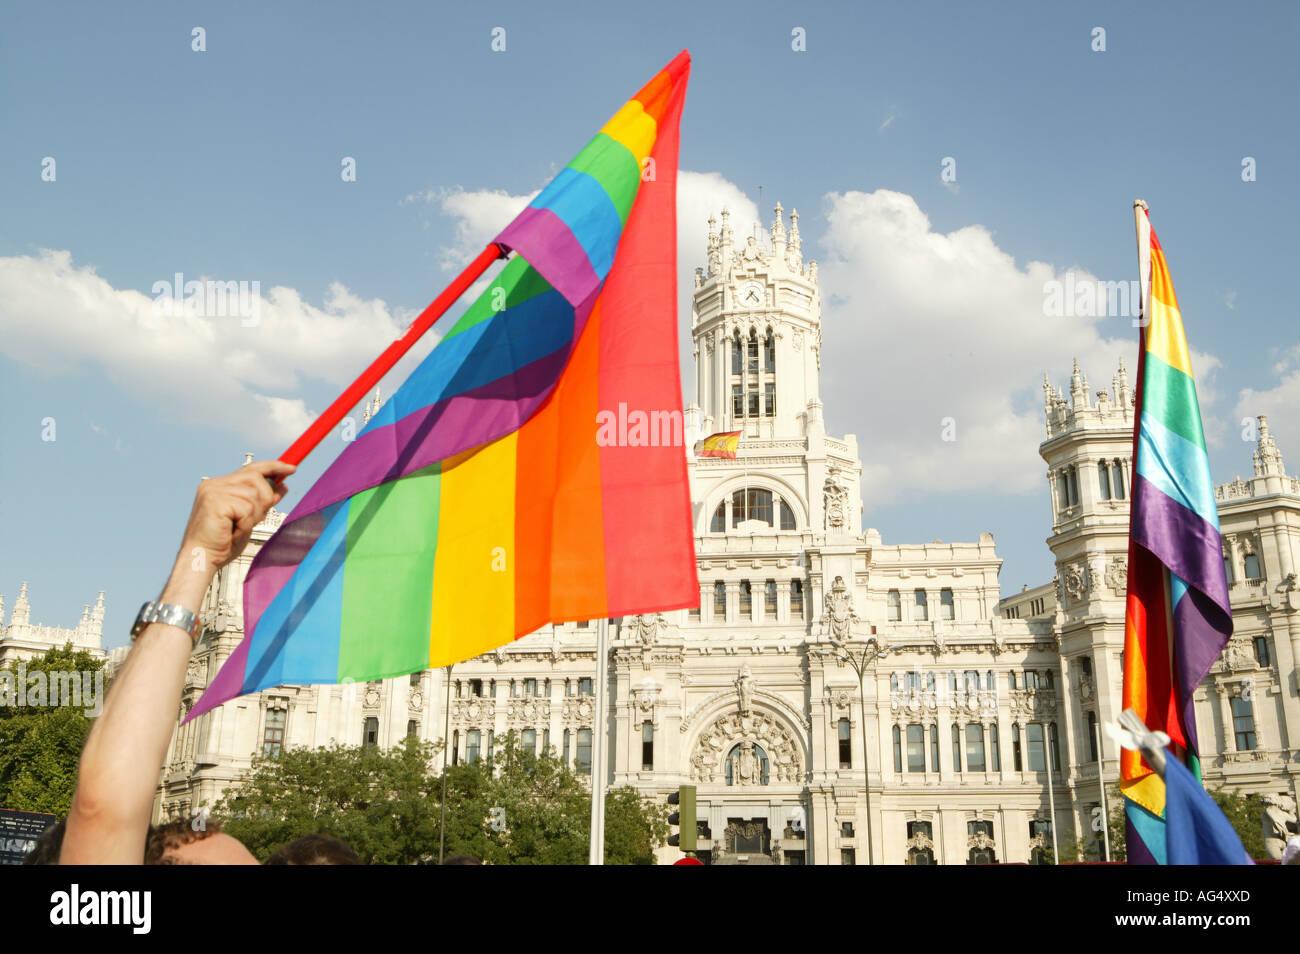 flag, gay, pride, holiday, Madrid, Cibeles, Spain, homosexual,